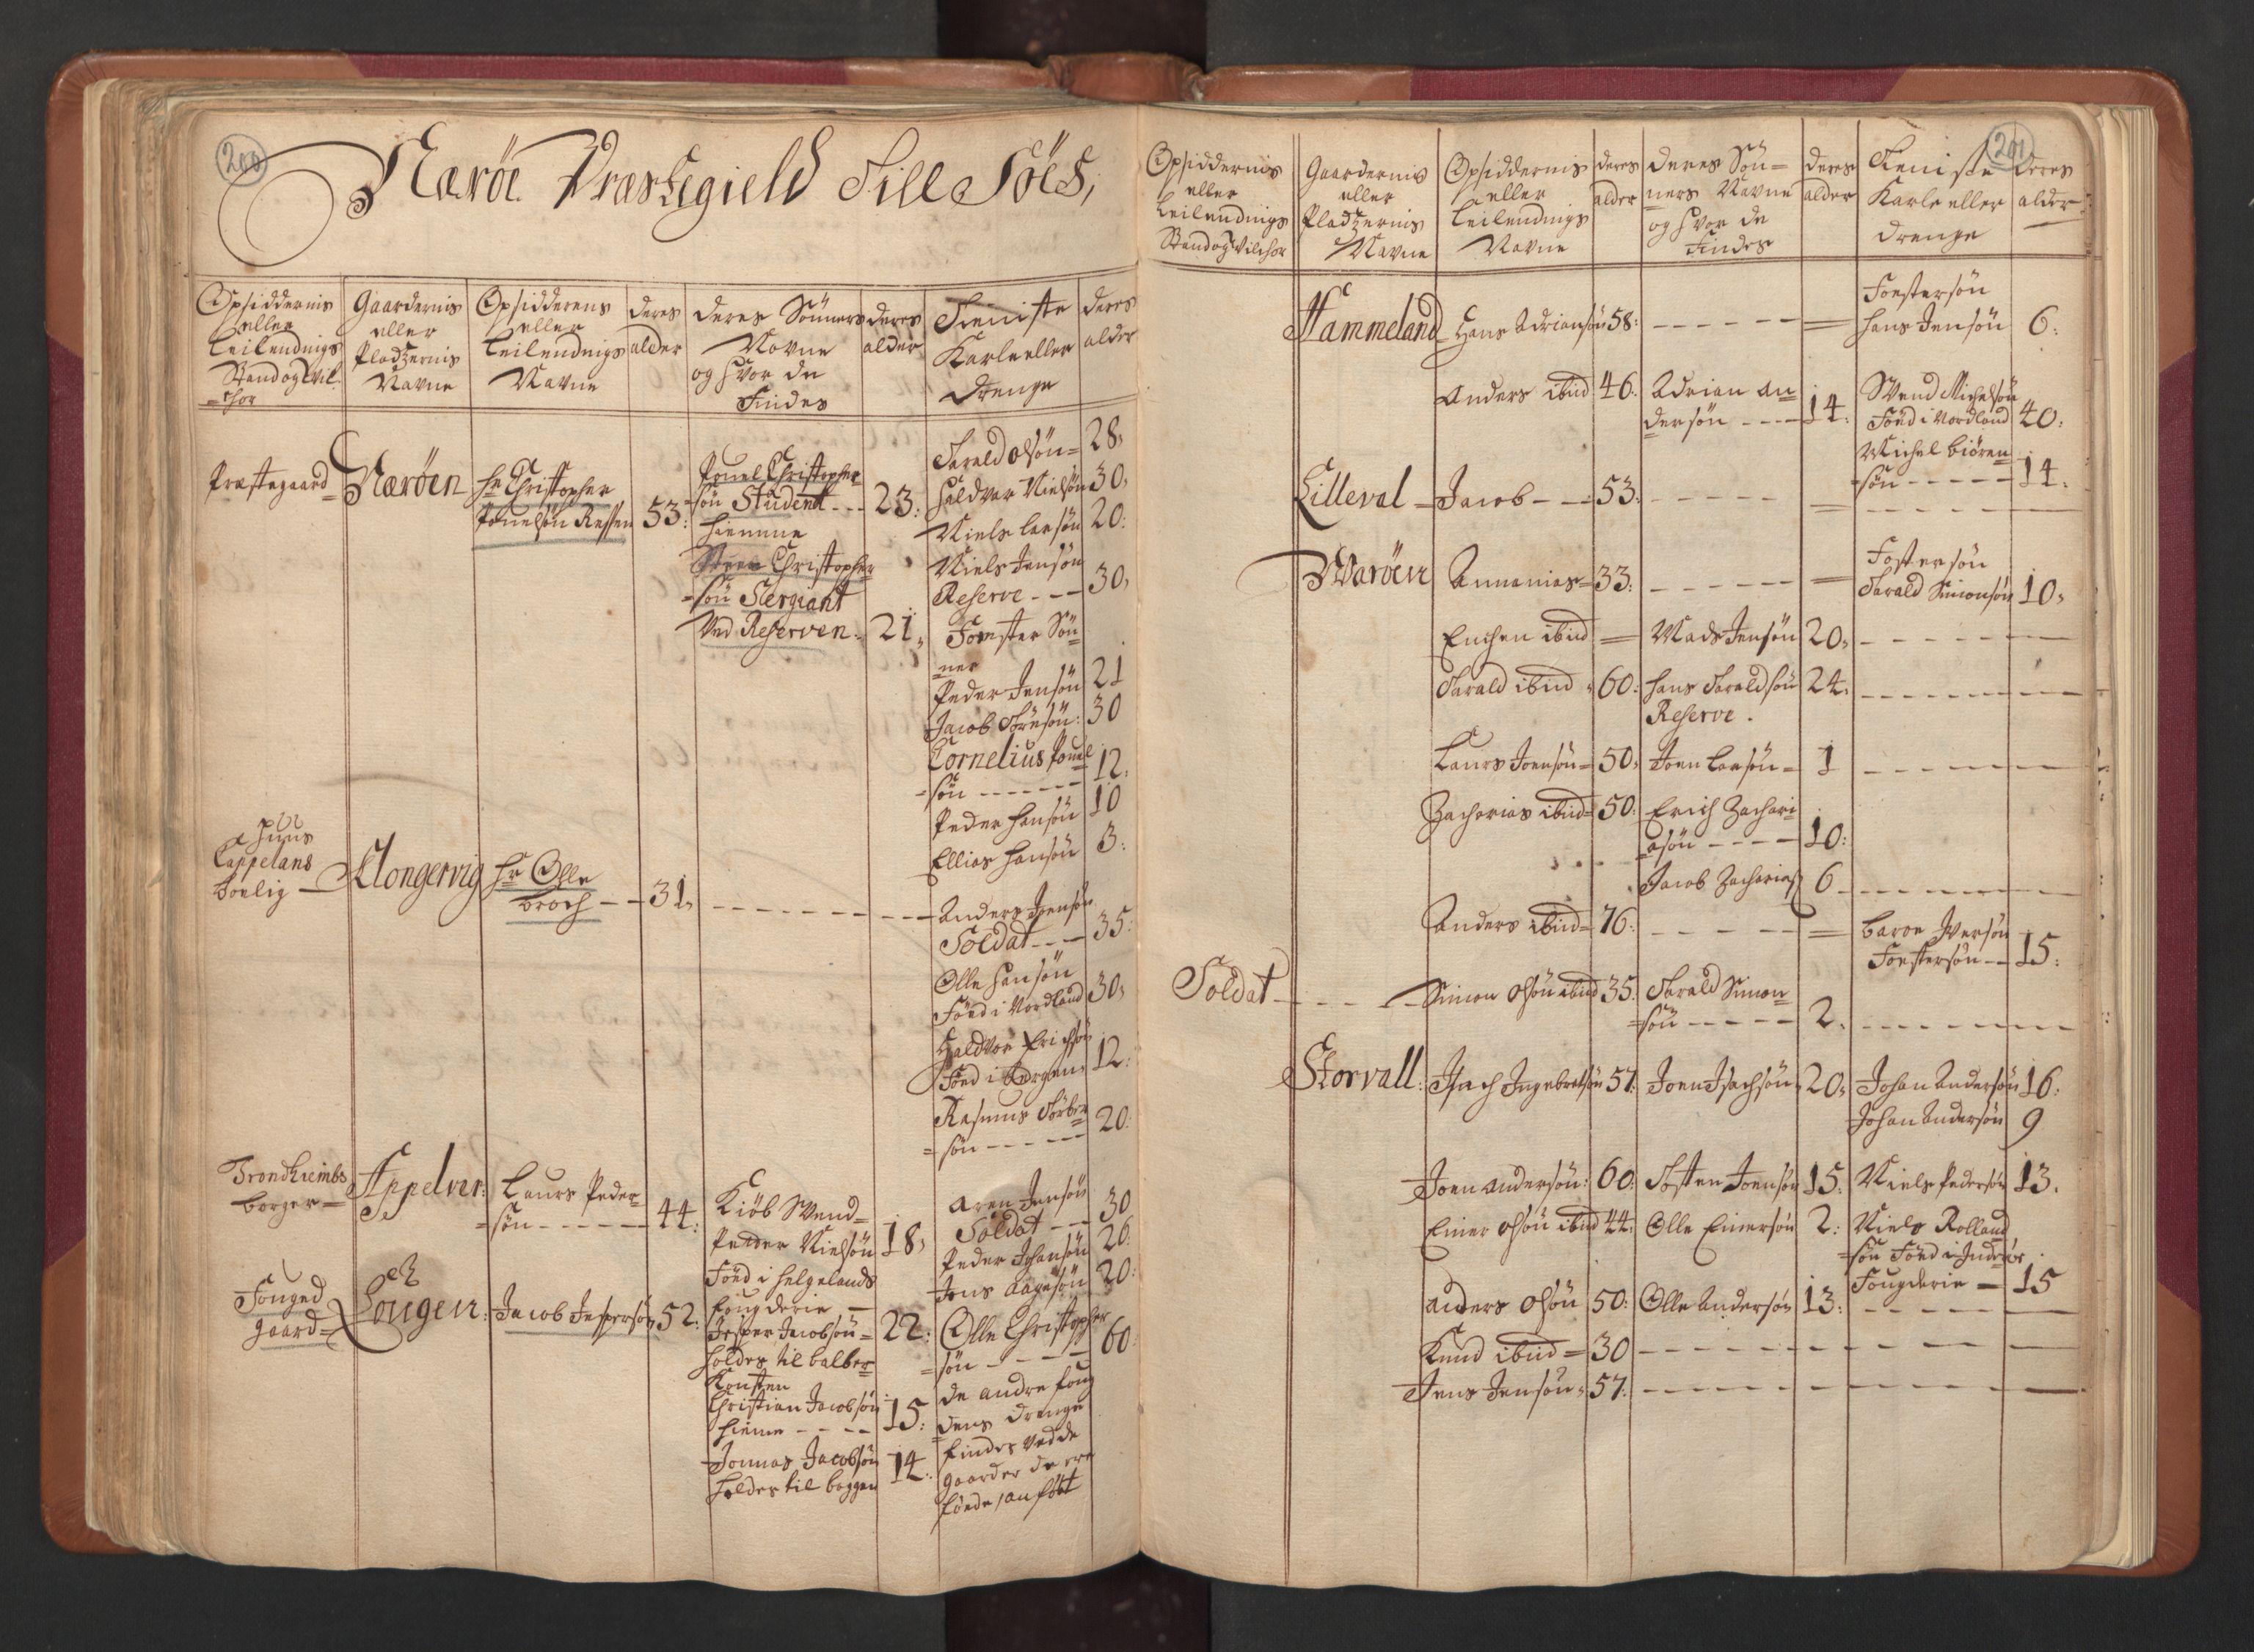 RA, Manntallet 1701, nr. 15: Inderøy fogderi og Namdal fogderi, 1701, s. 200-201